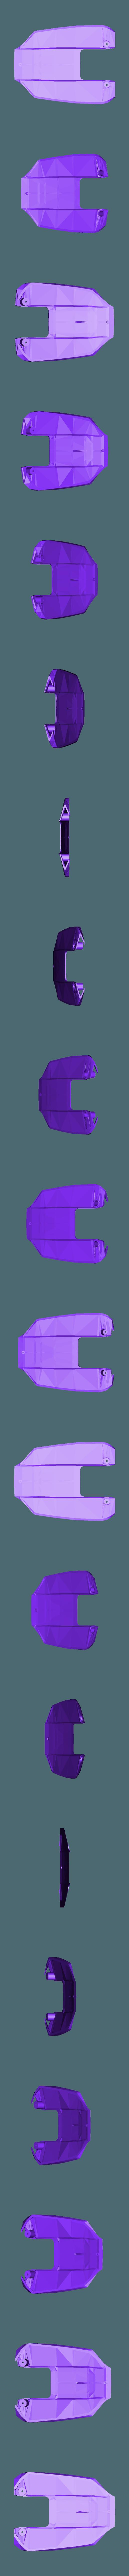 head_top.stl Download free STL file Foldable drone frame (Mavic look like, body & head alternative) Remix • 3D printer model, mwilmars